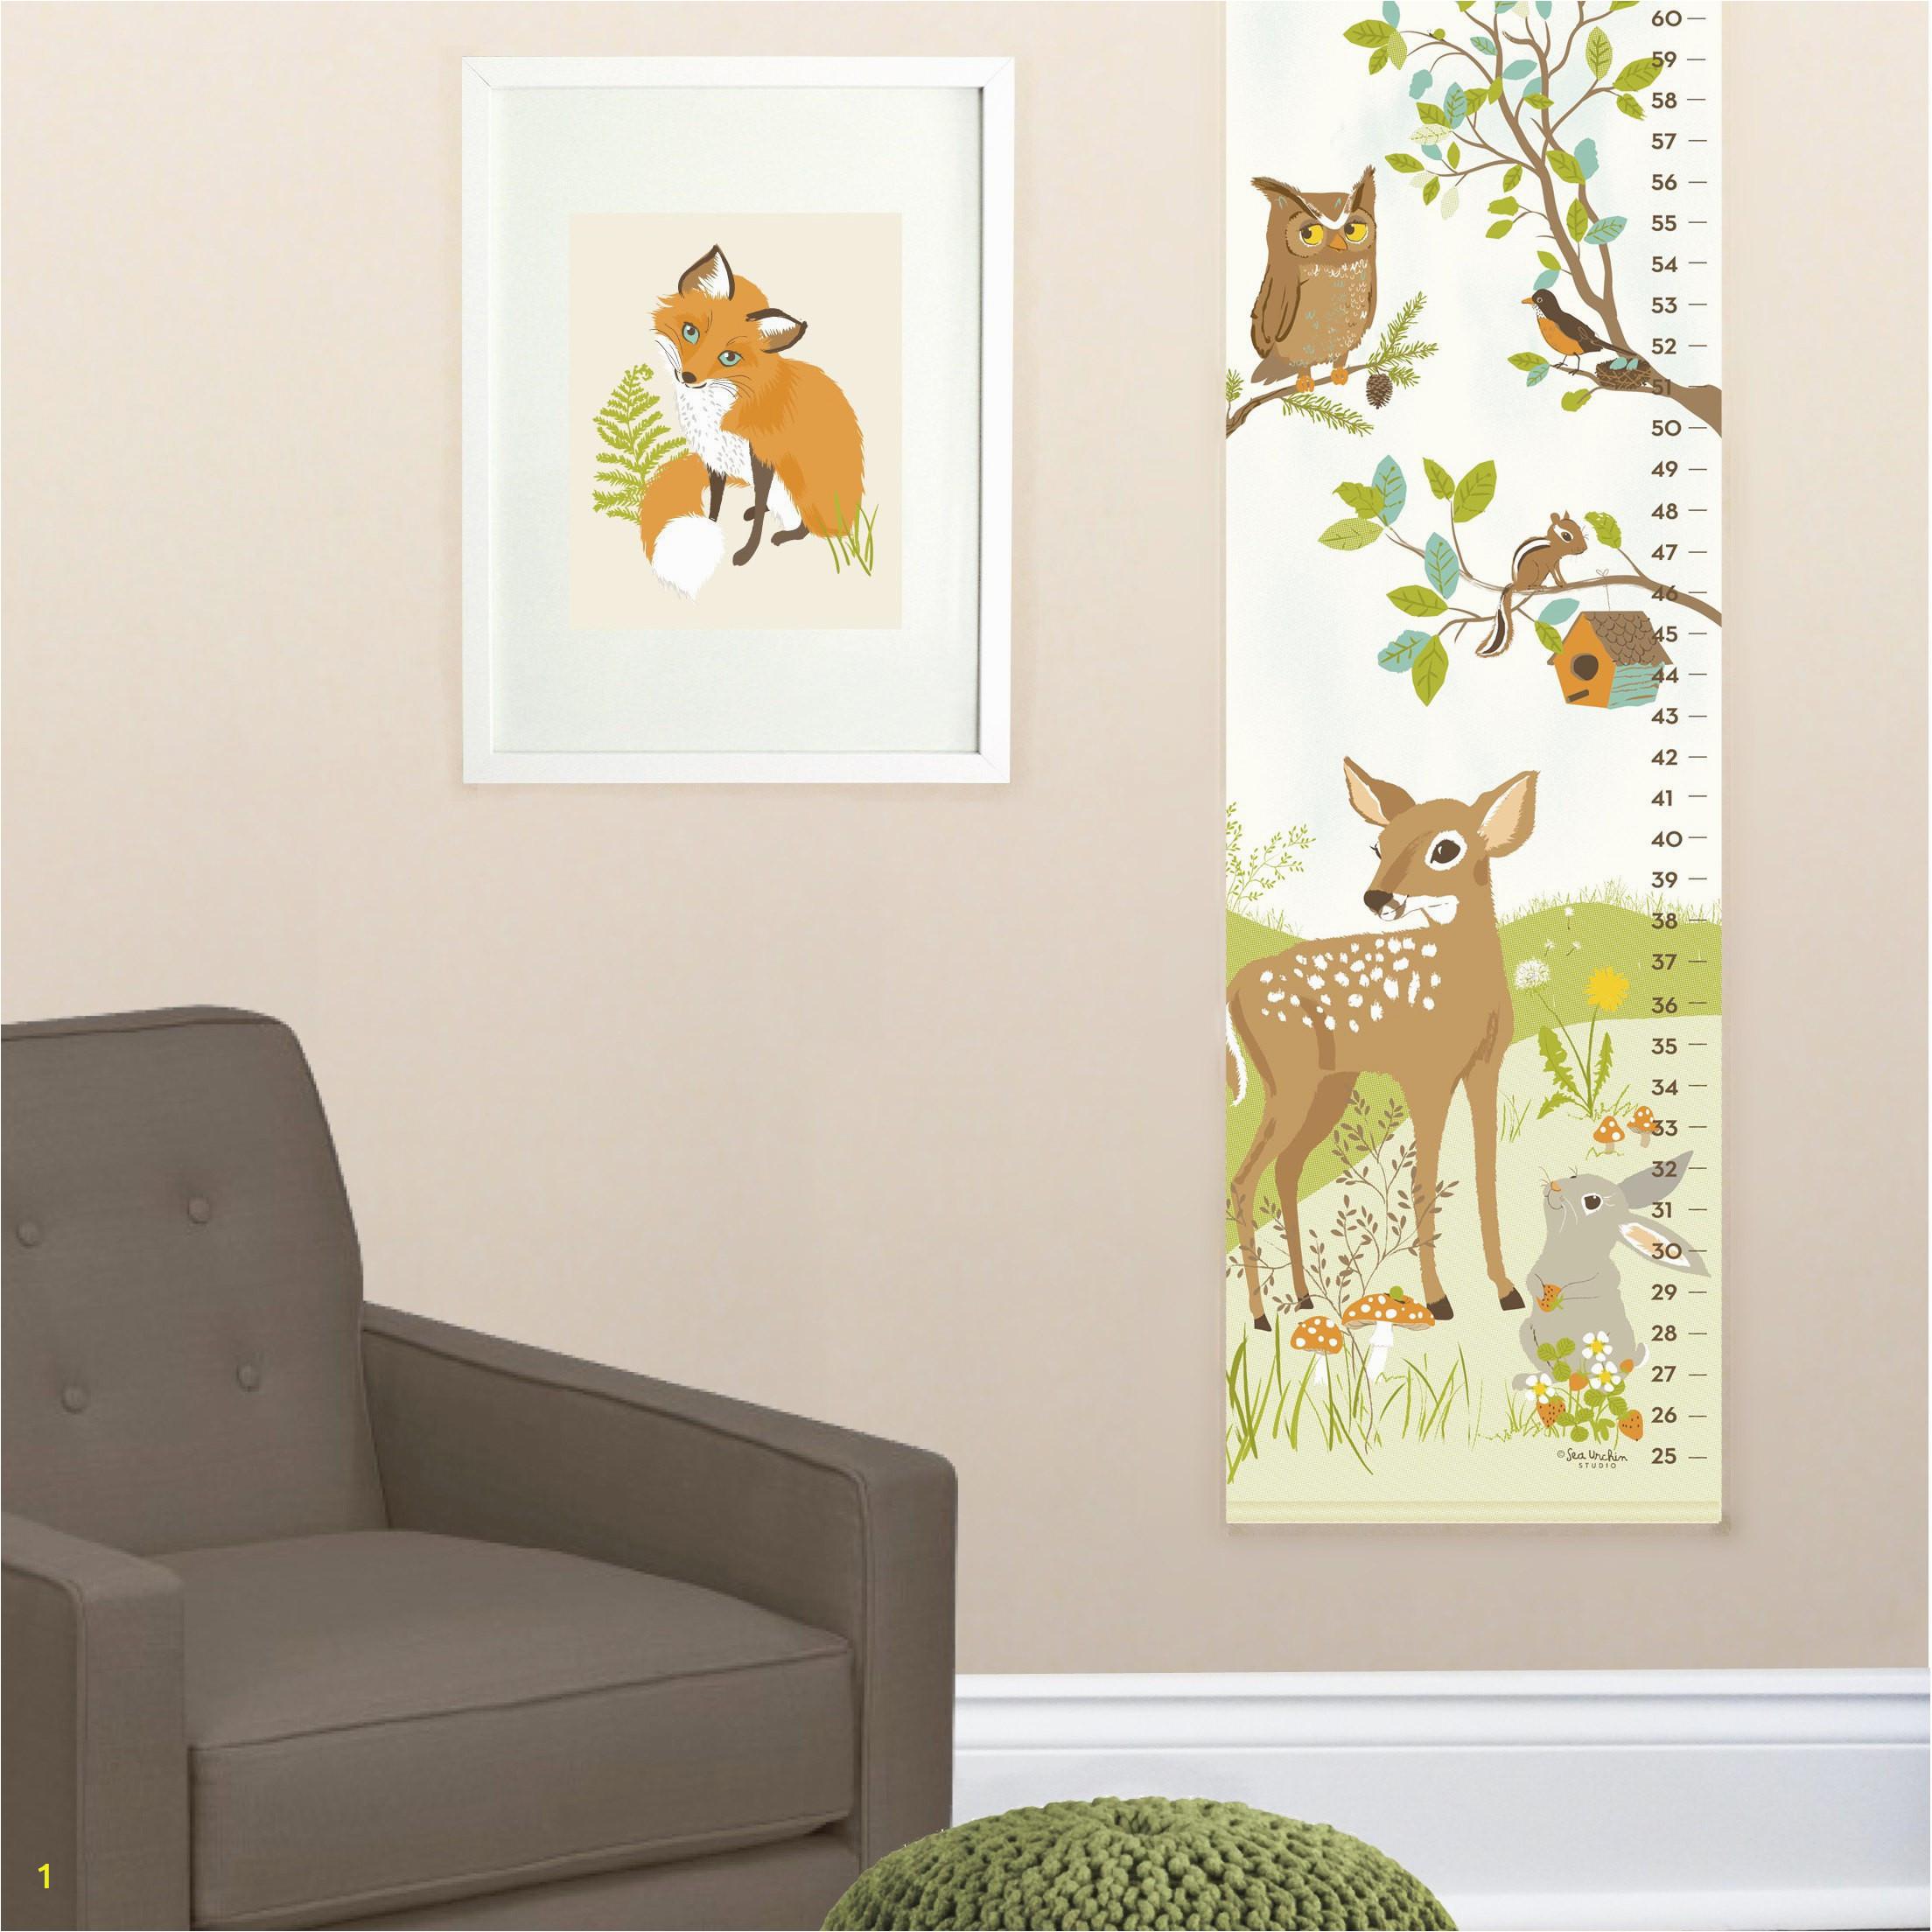 palm tree wall decals unique 1 kirkland wall decor home design 0d concerning wall art owl of wall art owl